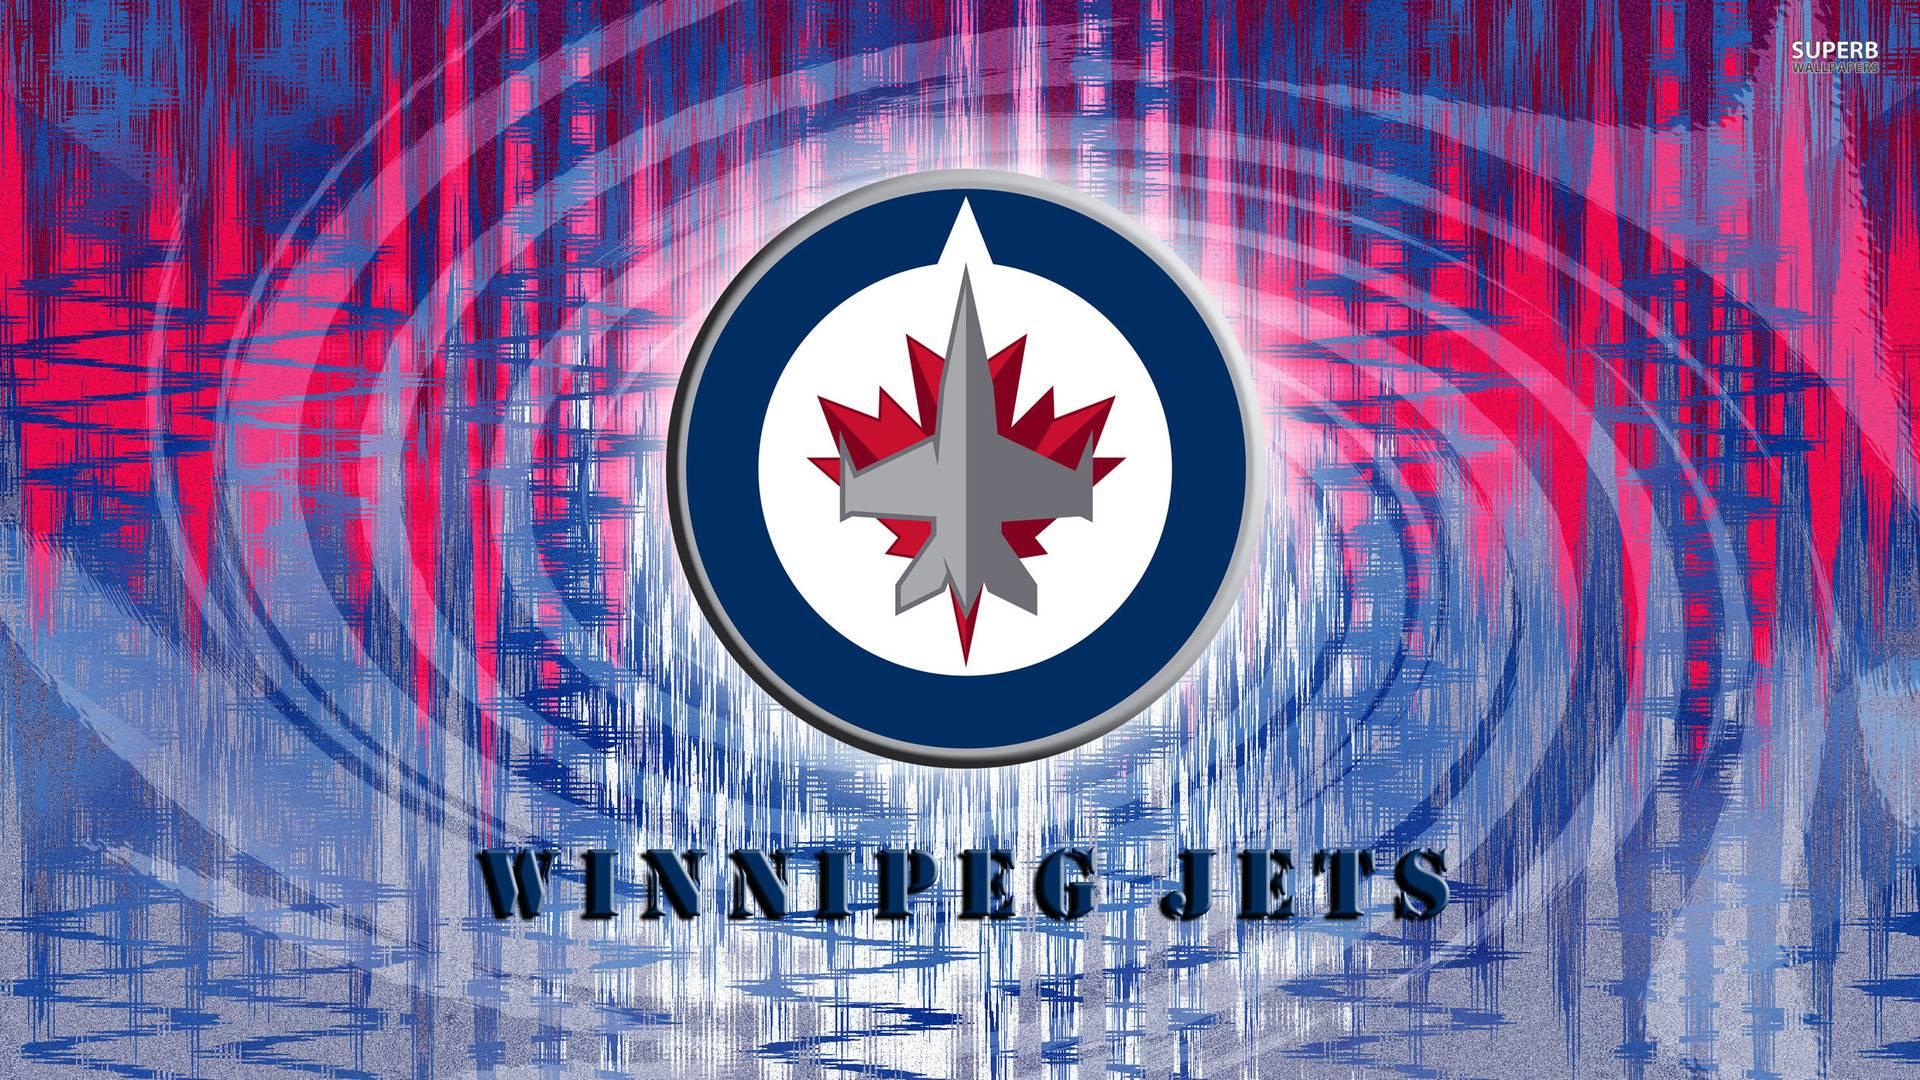 how to draw the winnipeg jets logo